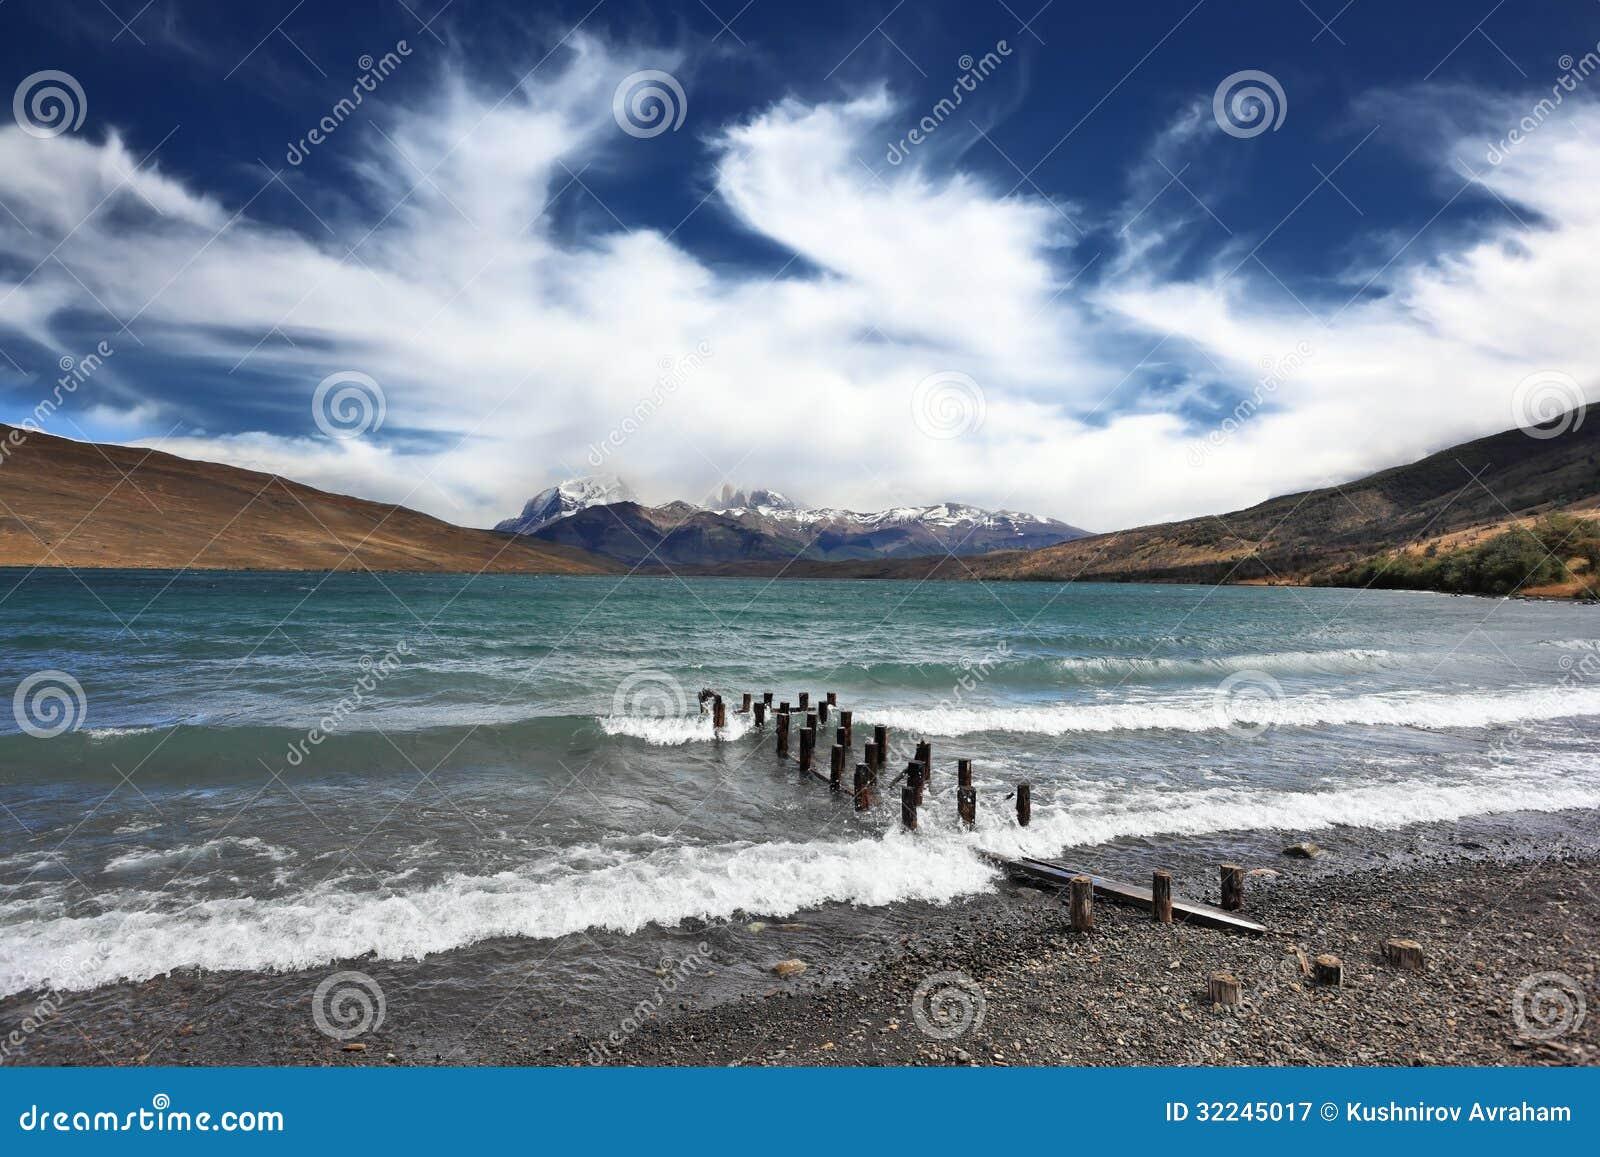 -storm-lake-boat-dock-poured-foaming-waves-mountains-surrounding-lake ...